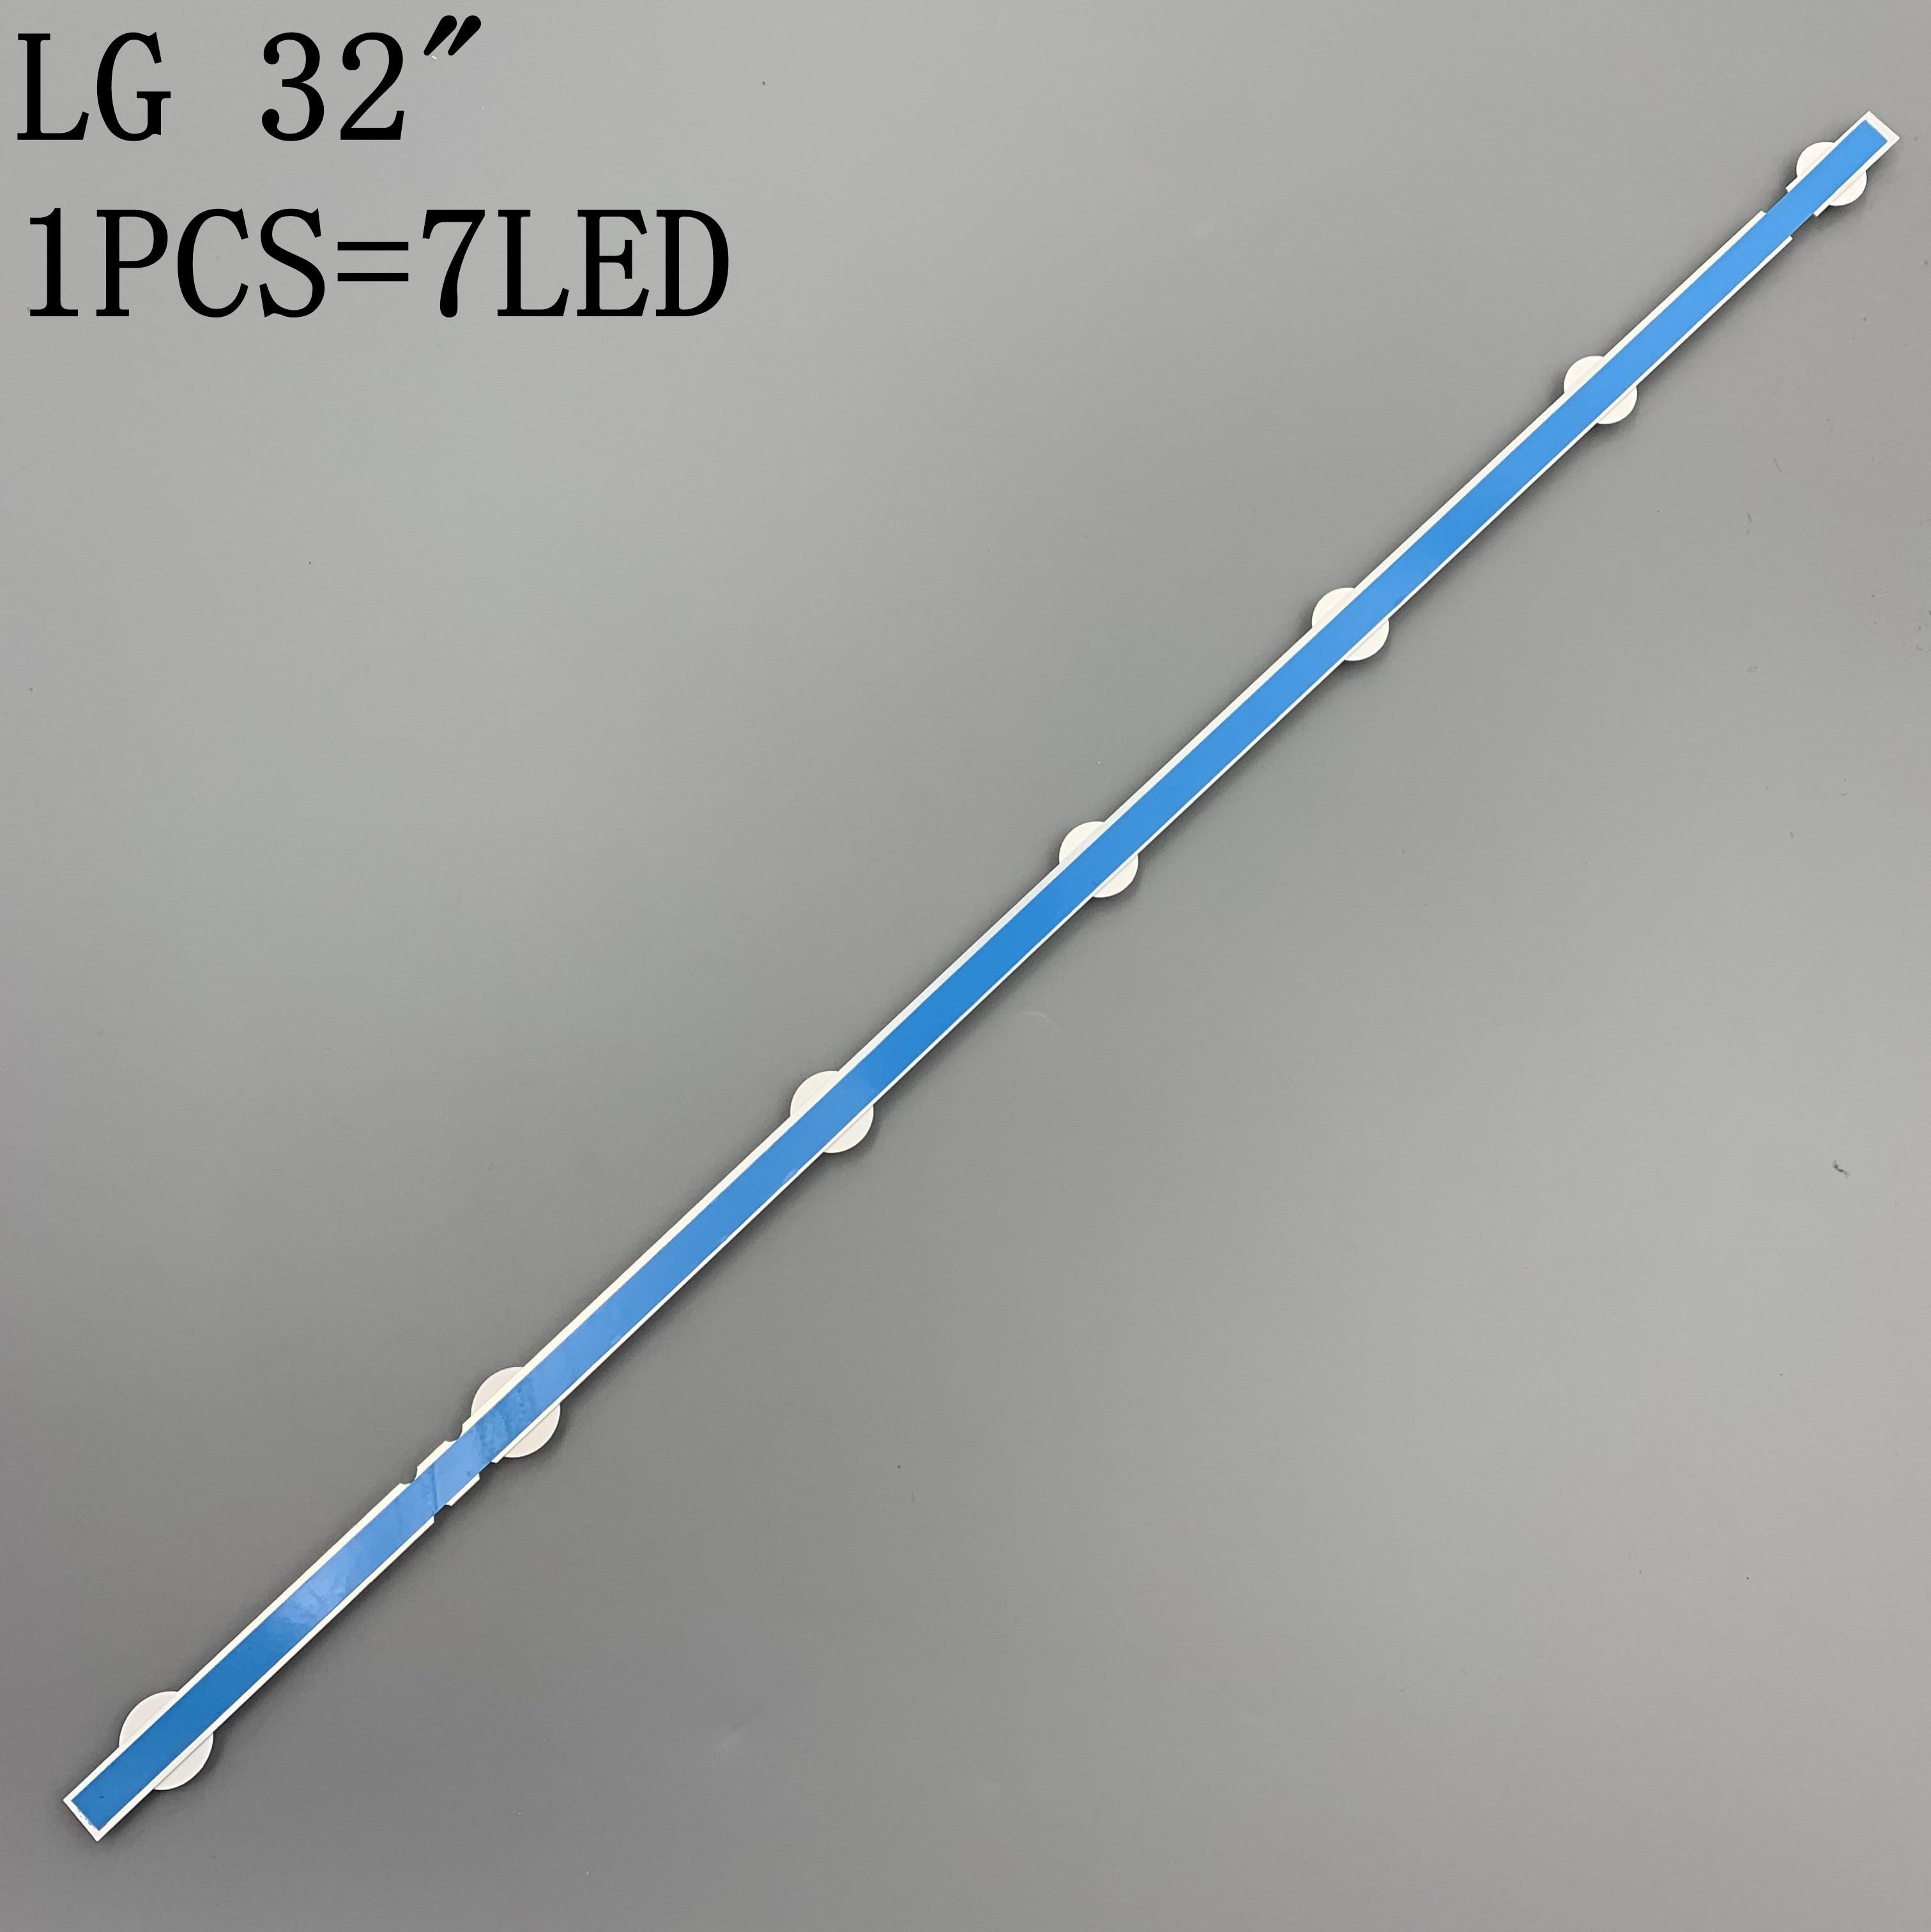 30pcs 7LED Backlight Lamp Strip for LG 32 TV 32ln541v 32LN540V A1 B1-Type 6916L-1437A 6916L-1438A 6916L-1204A 6916L-1426A 63cm enlarge